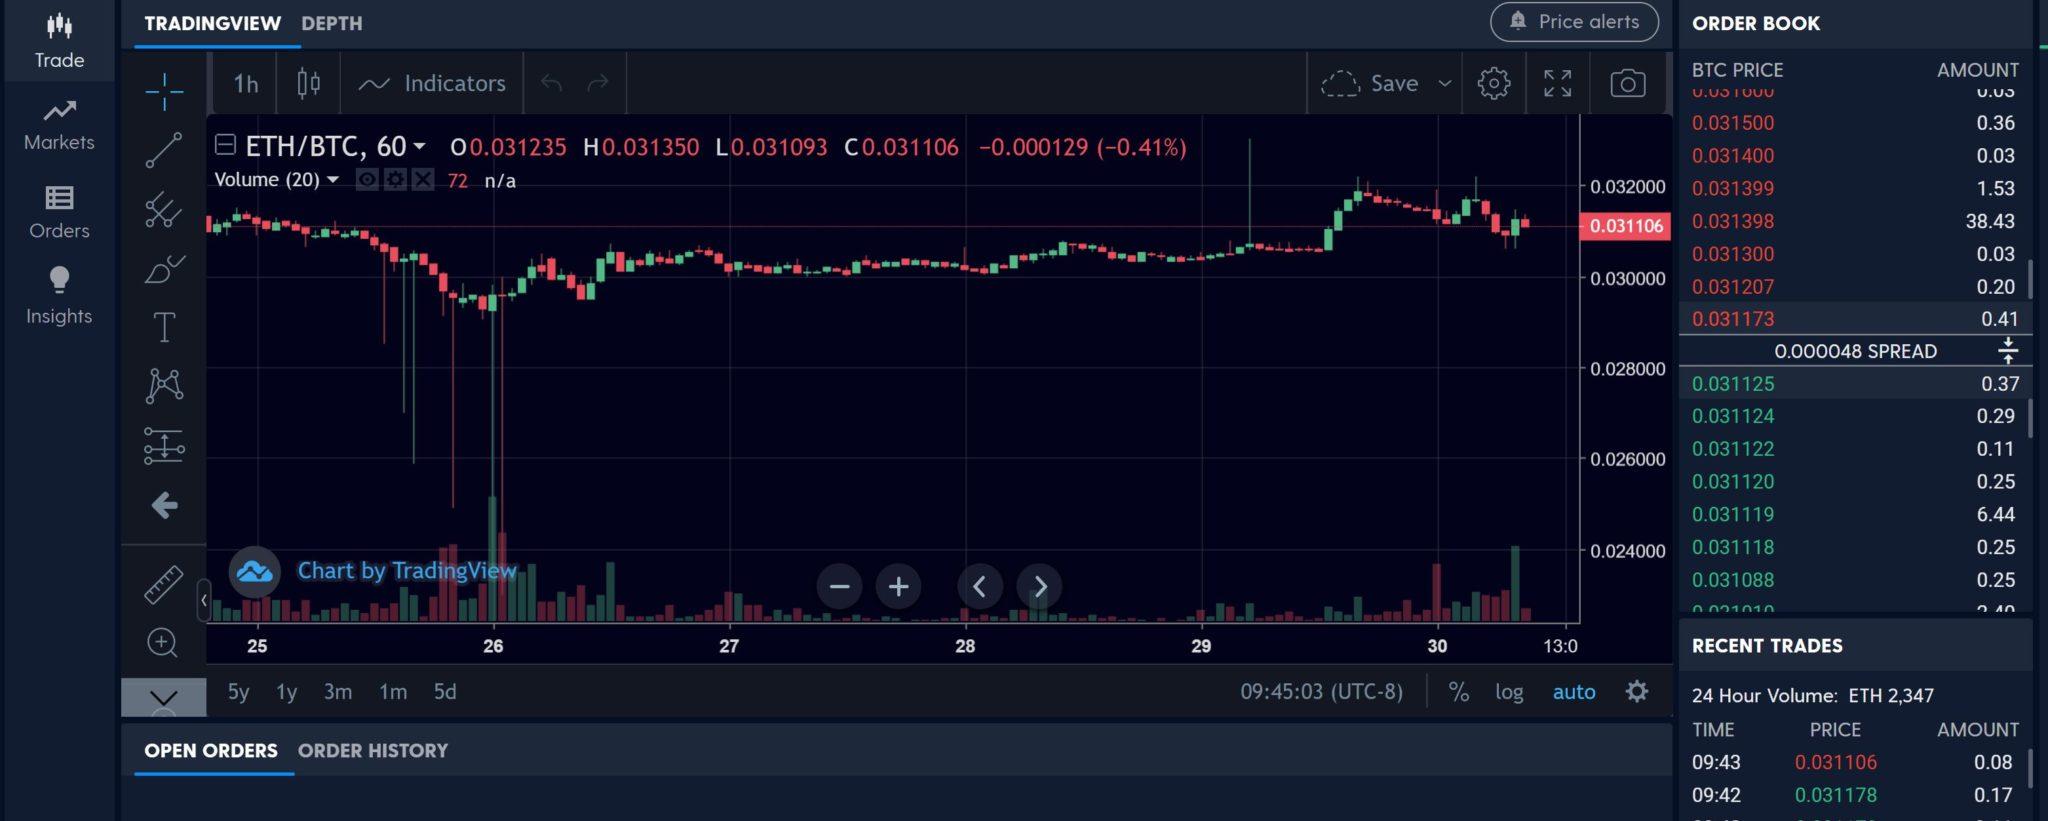 Luno Trading Platform